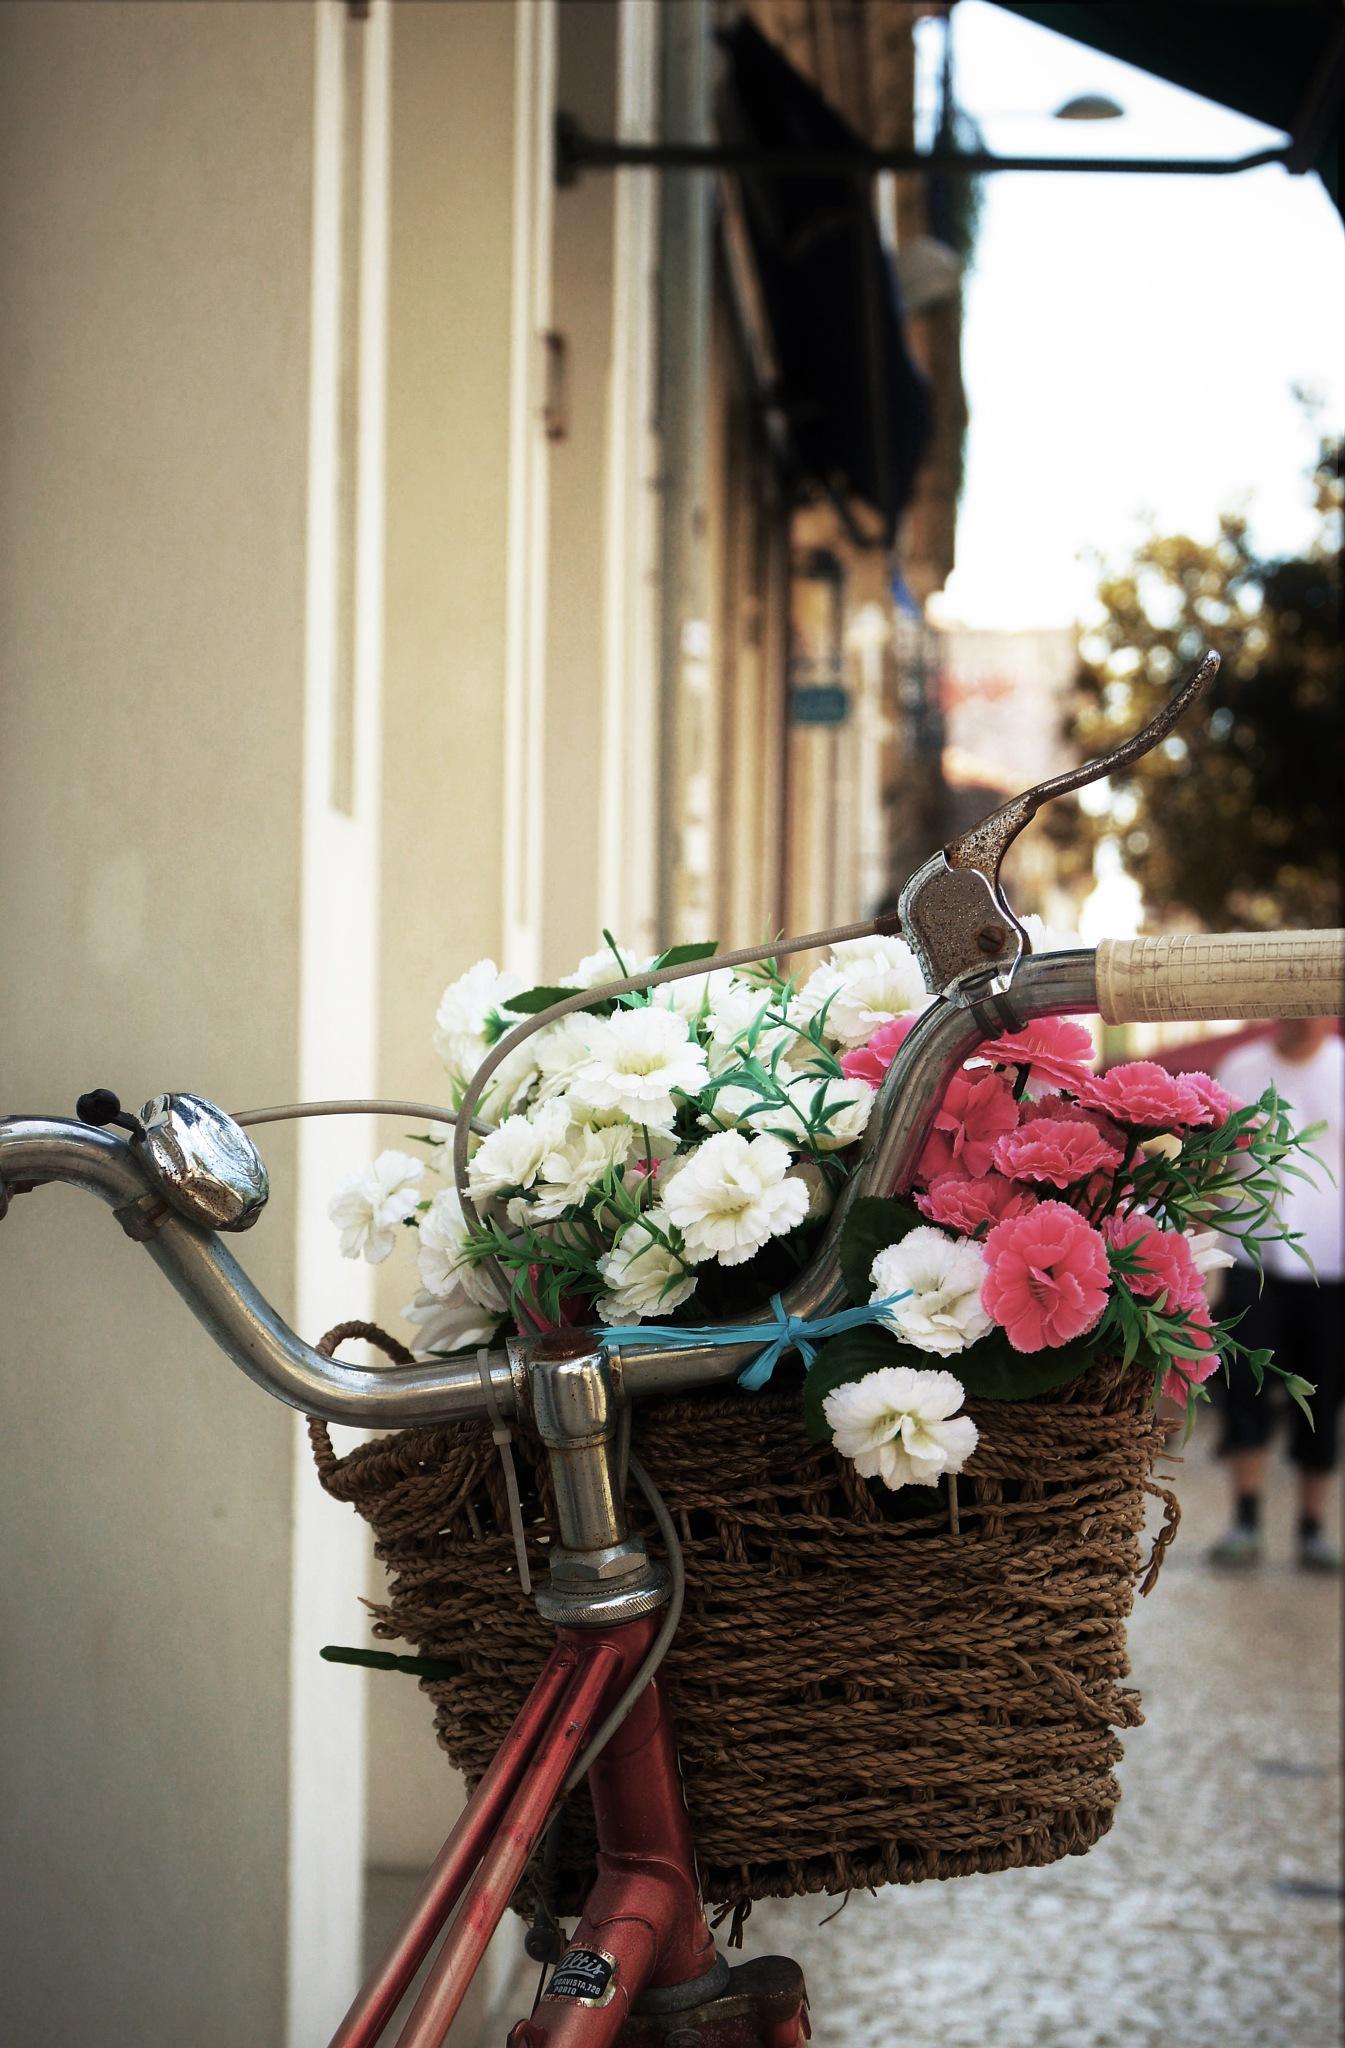 flower bike by SorayavdB